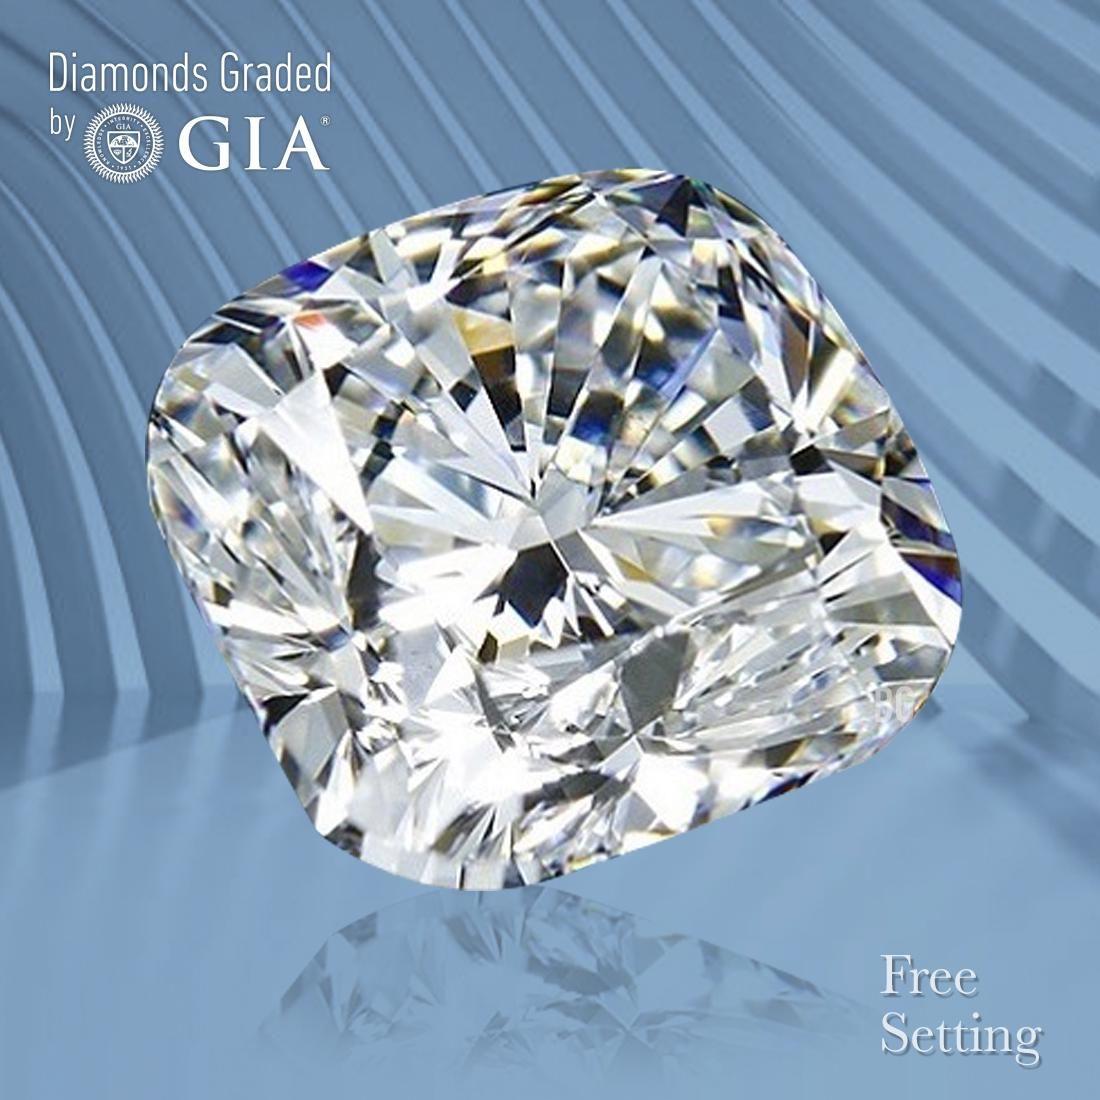 1.51 ct, Color F/VVS2, Cushion cut GIA Graded Diamond